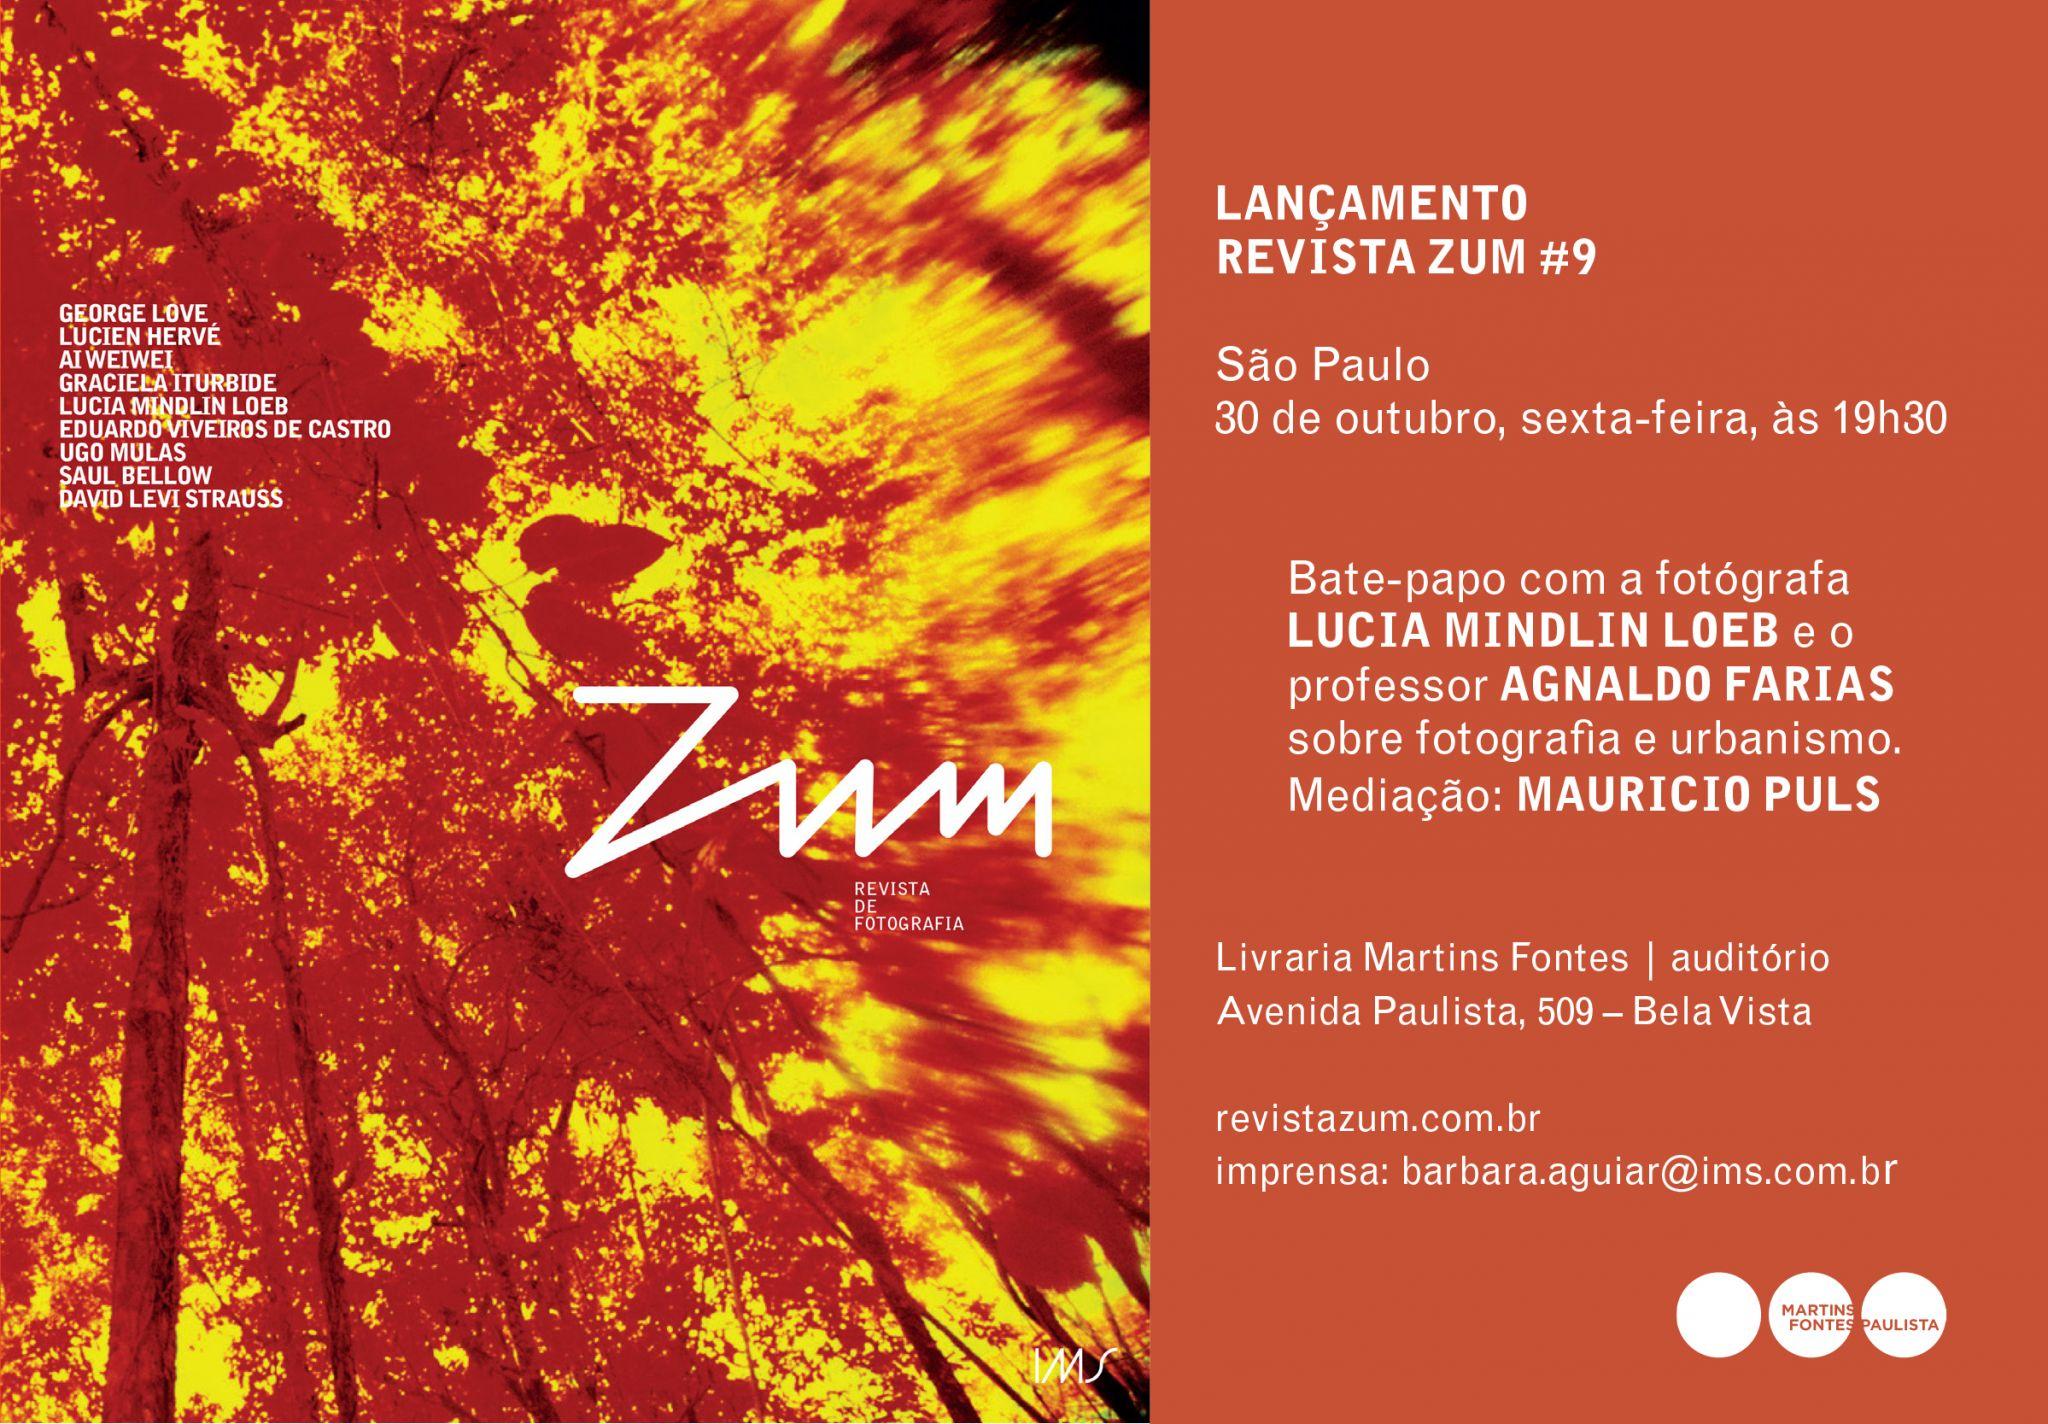 convite_lancamento_zum